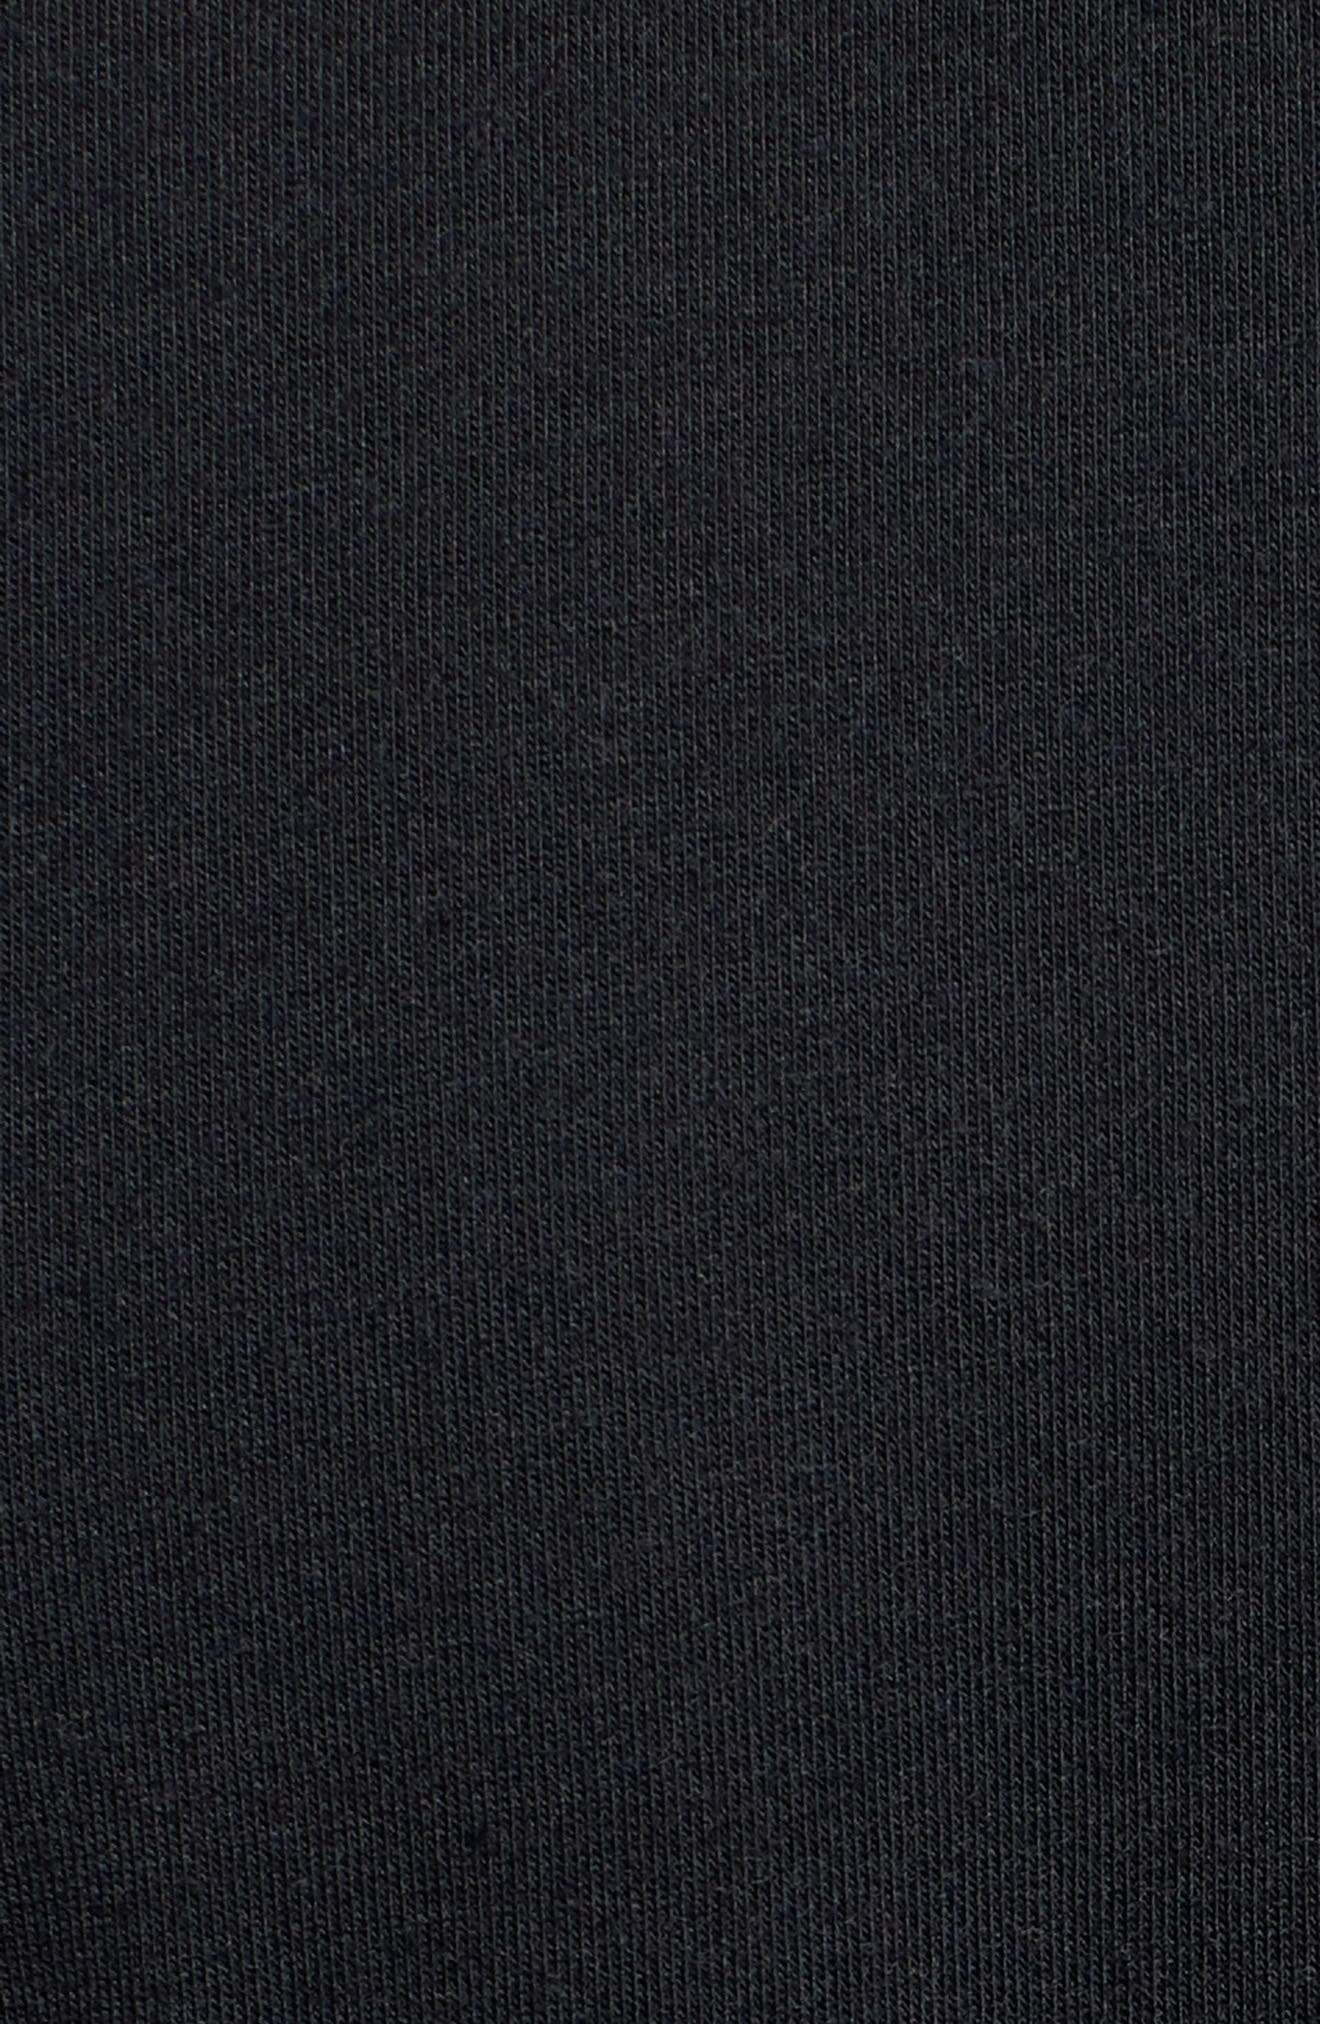 Microthread Swyft V-Neck T-Shirt,                             Alternate thumbnail 5, color,                             BLACK/ BLACK/ REFLECTIVE